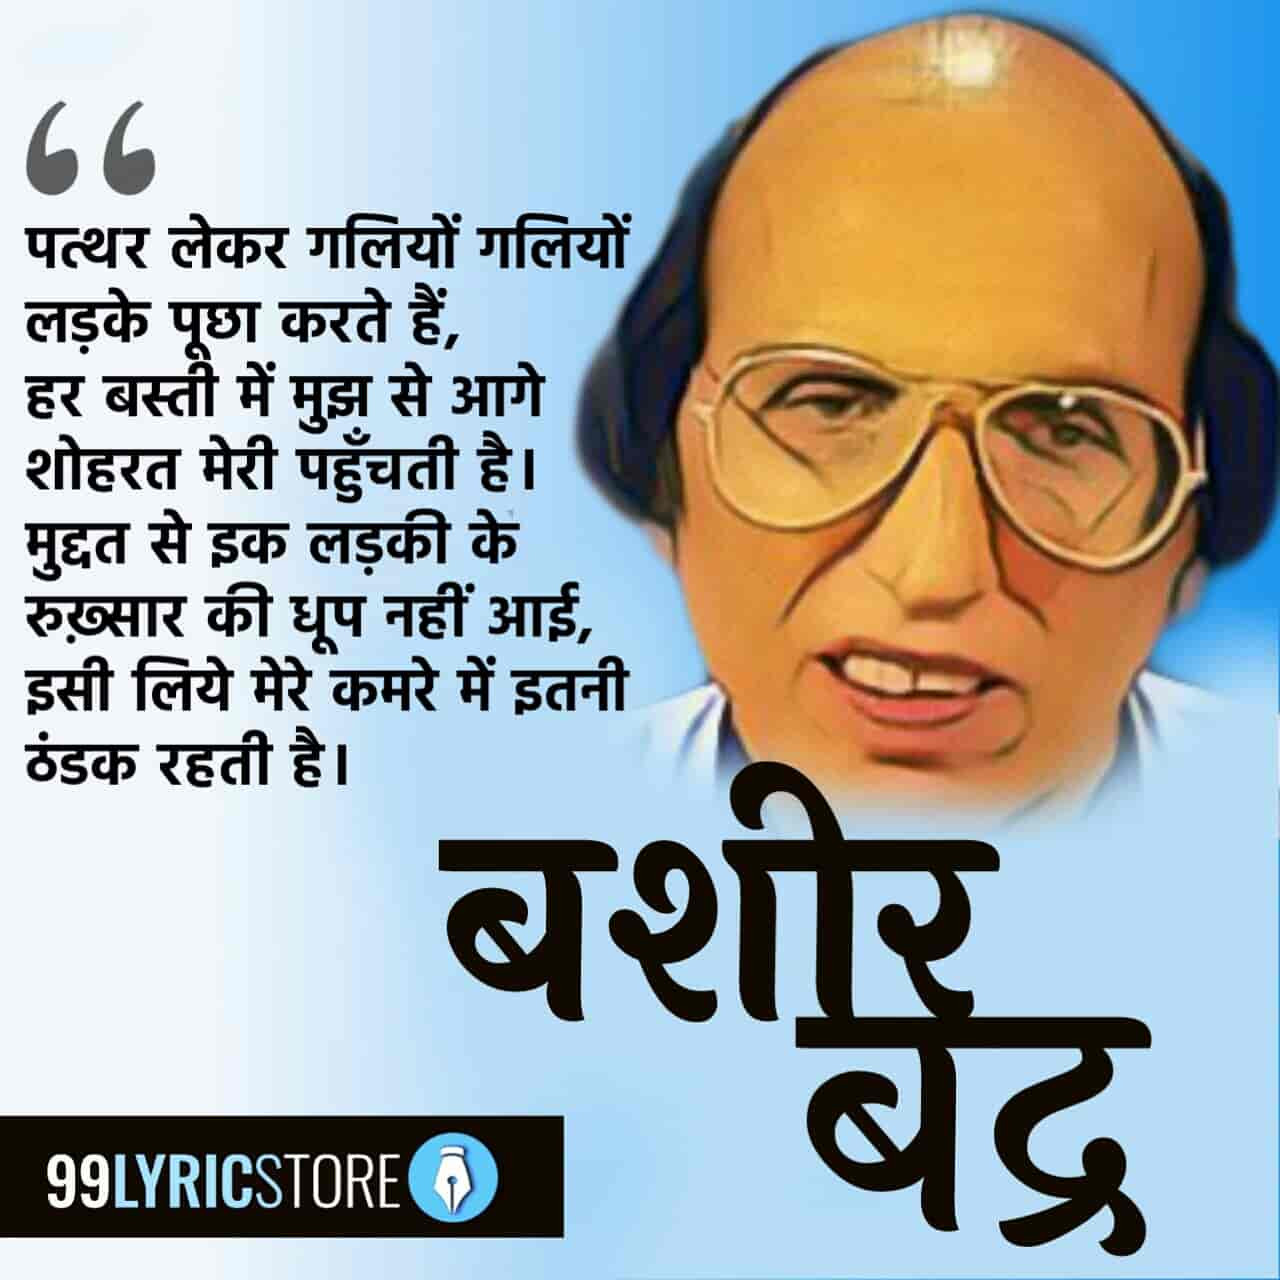 This Beautiful ghazal 'Yaad Kisi Ki Chandani Ban Kar' has written by Bashir Badr.